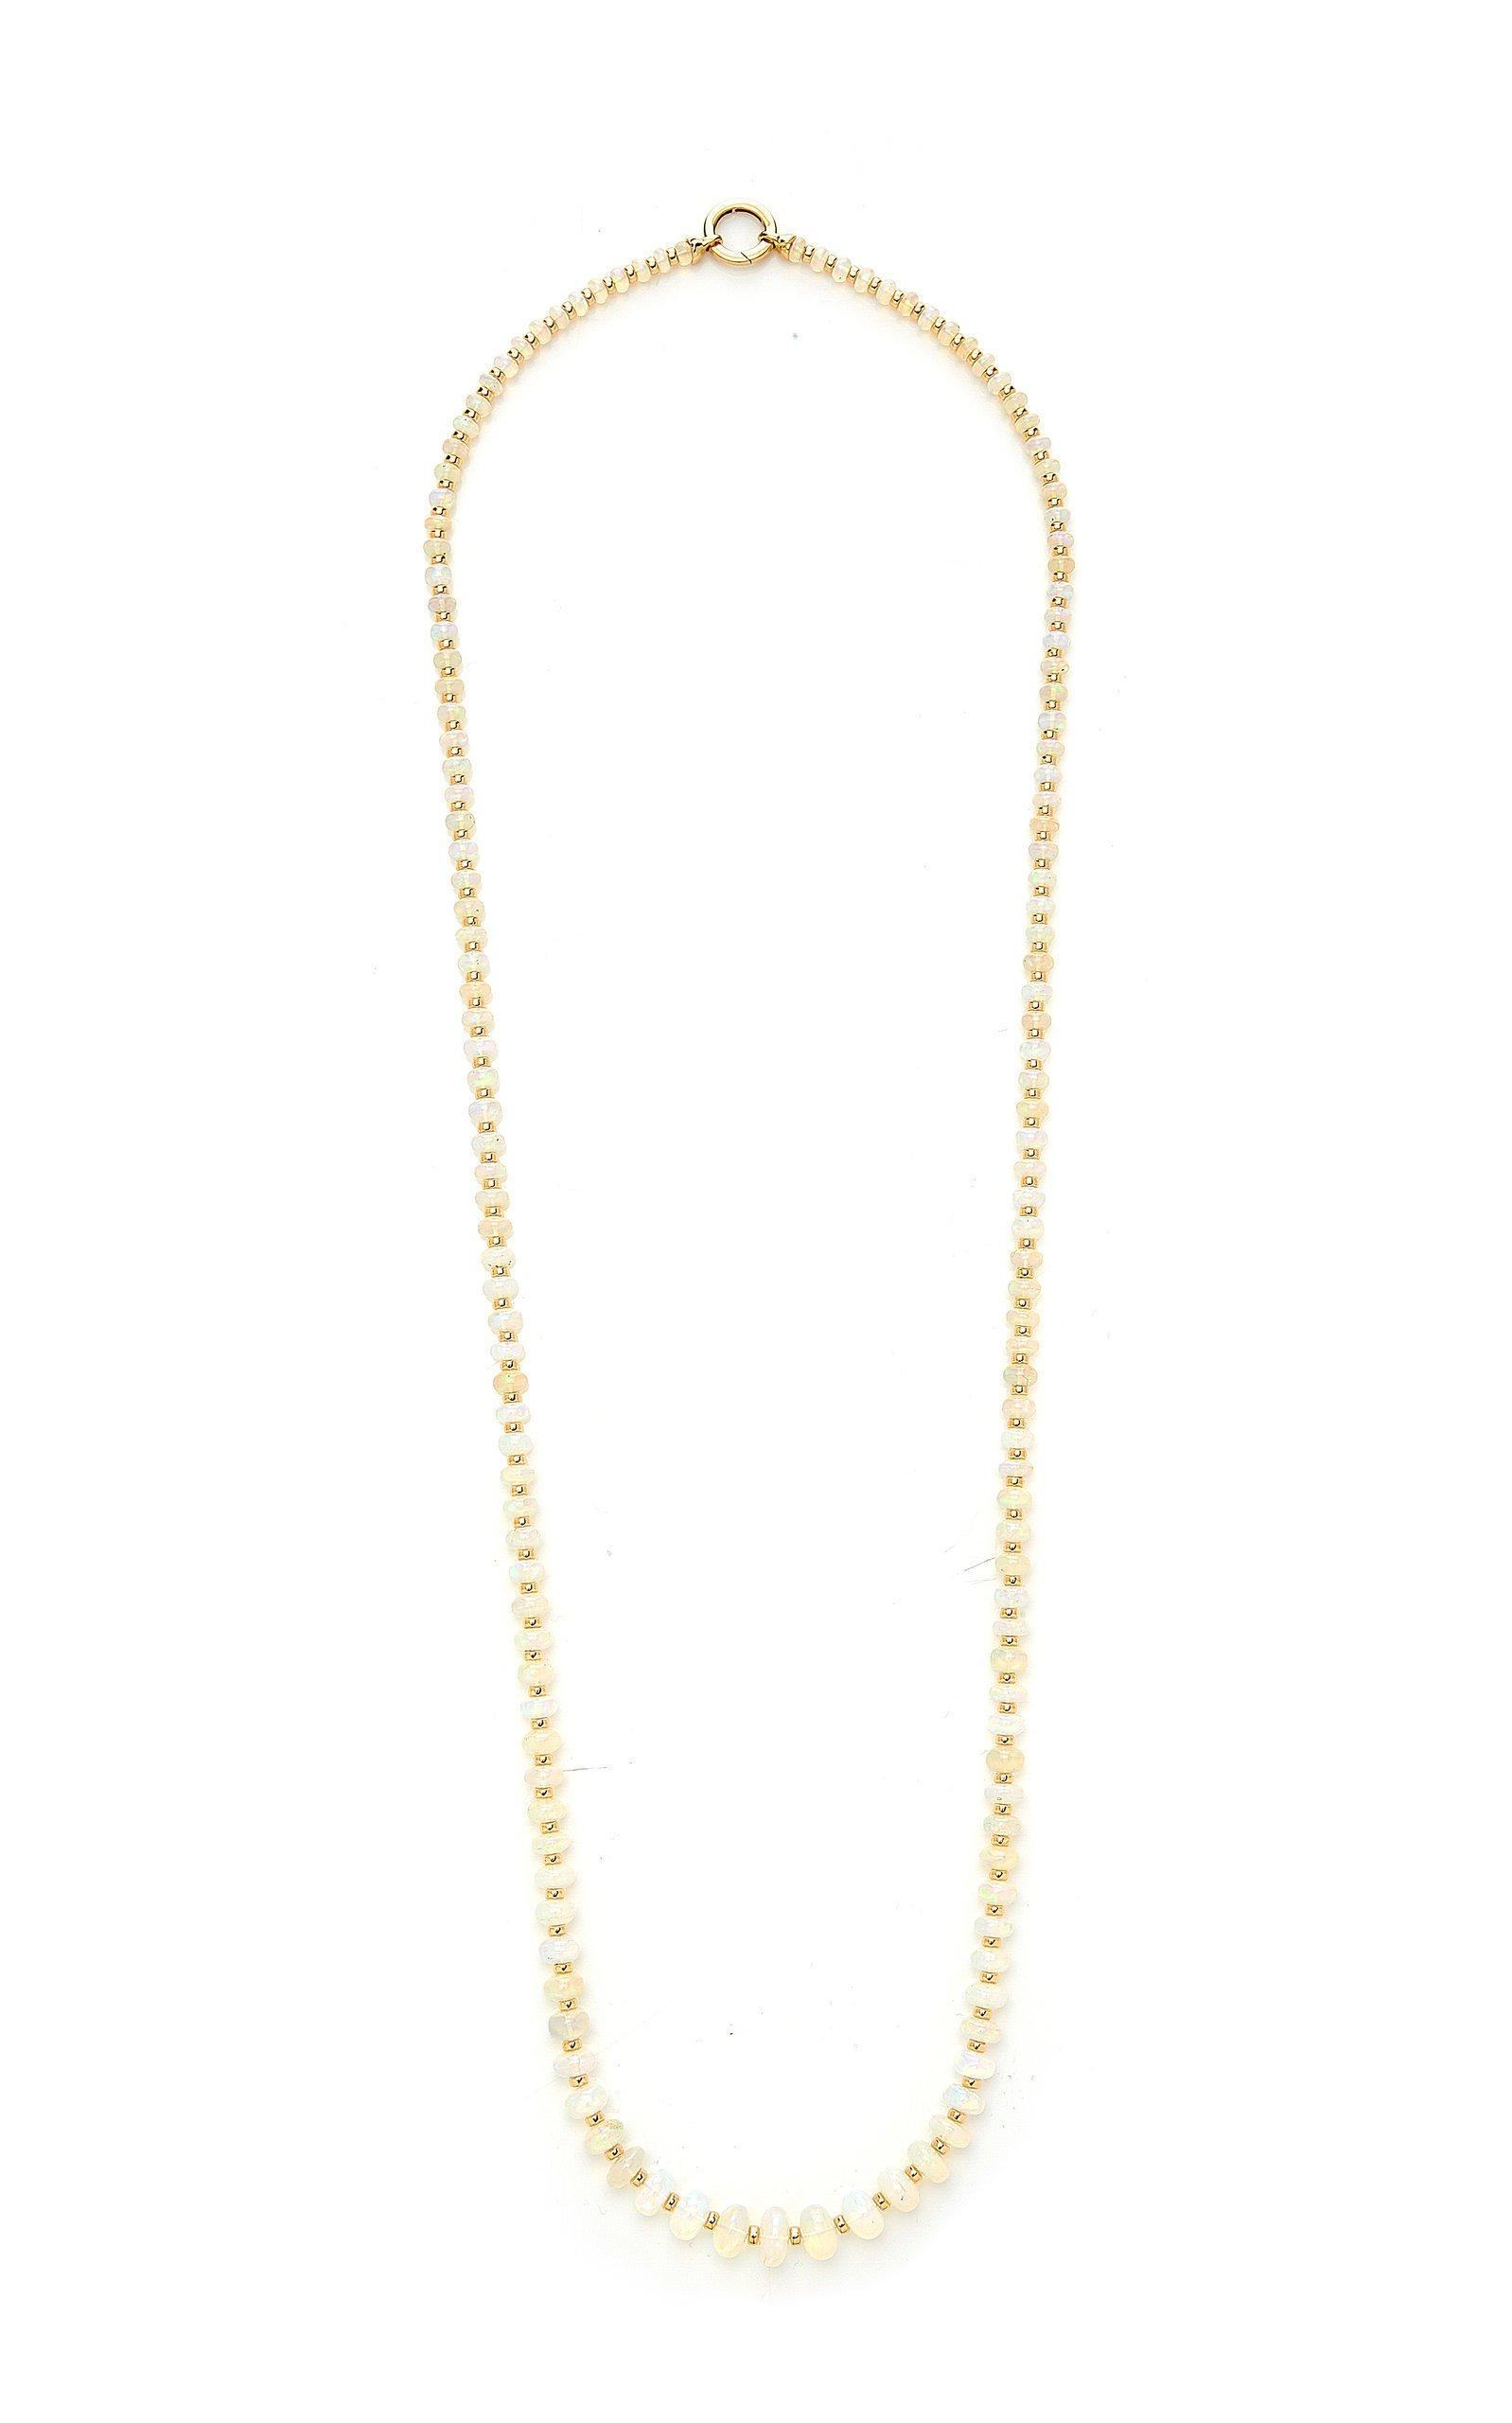 Goshwara BEYOND 1 strand Opal Beads Necklace